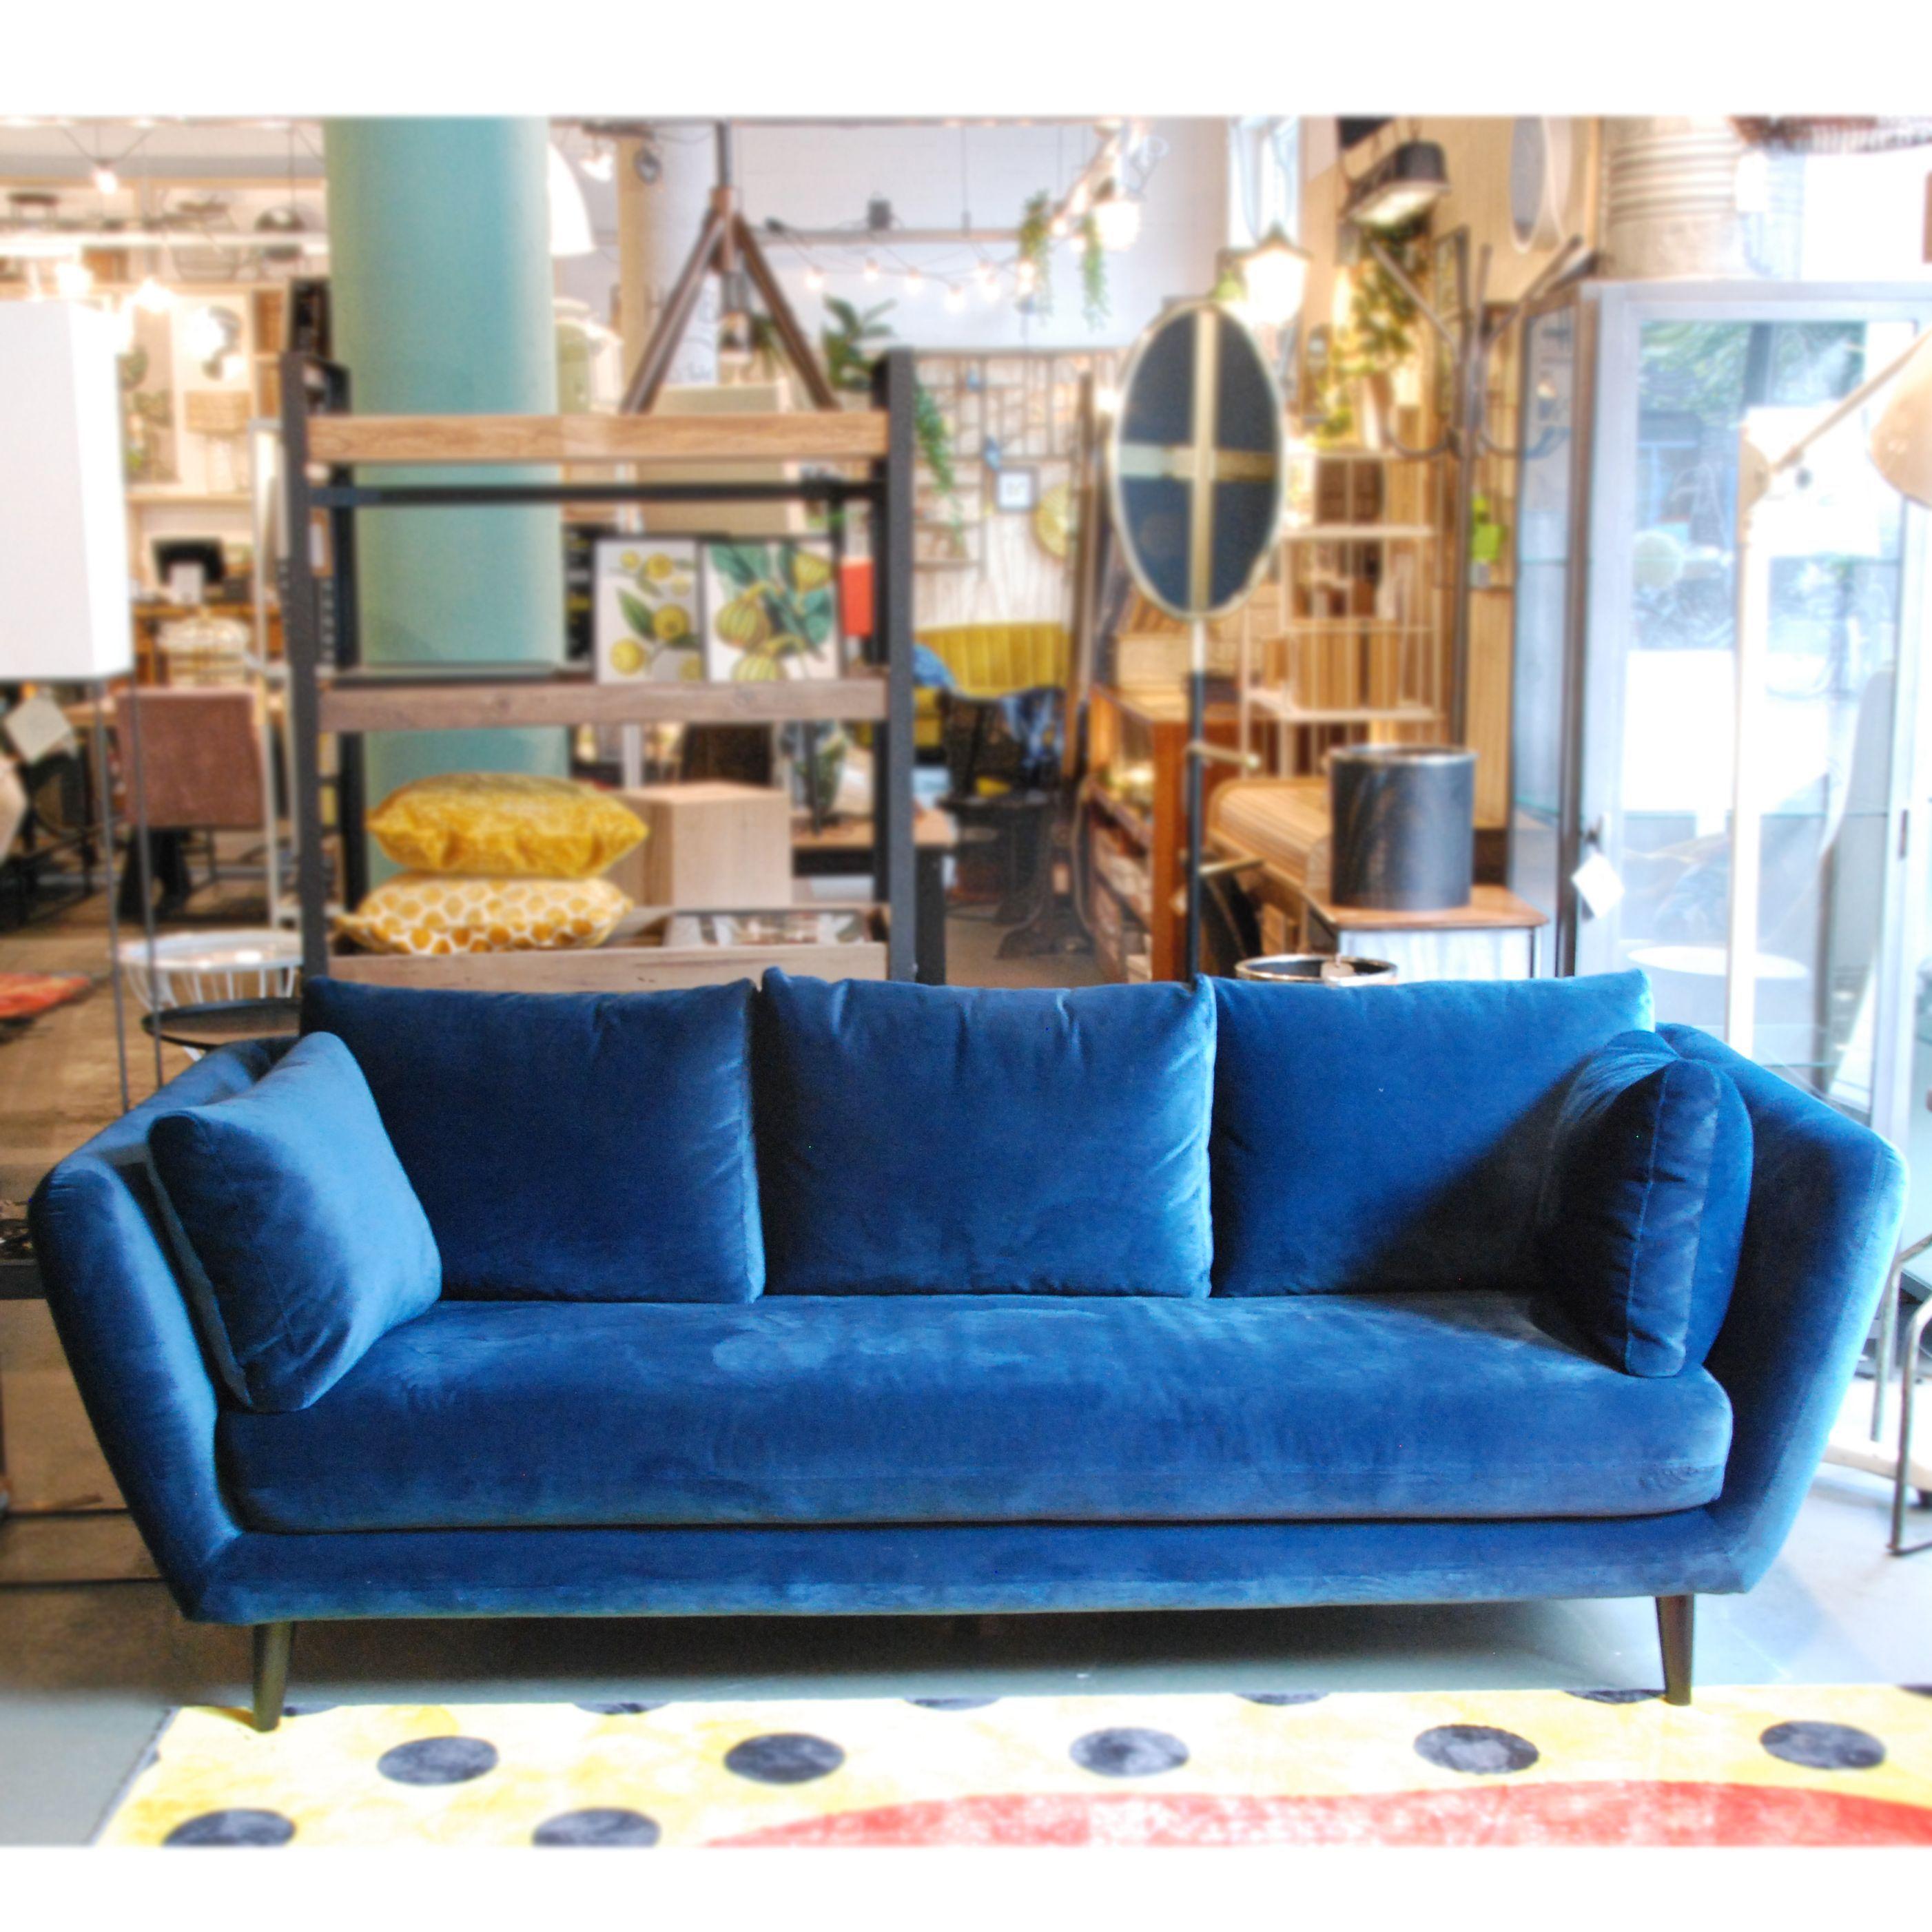 Blauwe Design Bank.Image Result For Lola 3 Zits Homestock Blauwe Bank Woonkamer